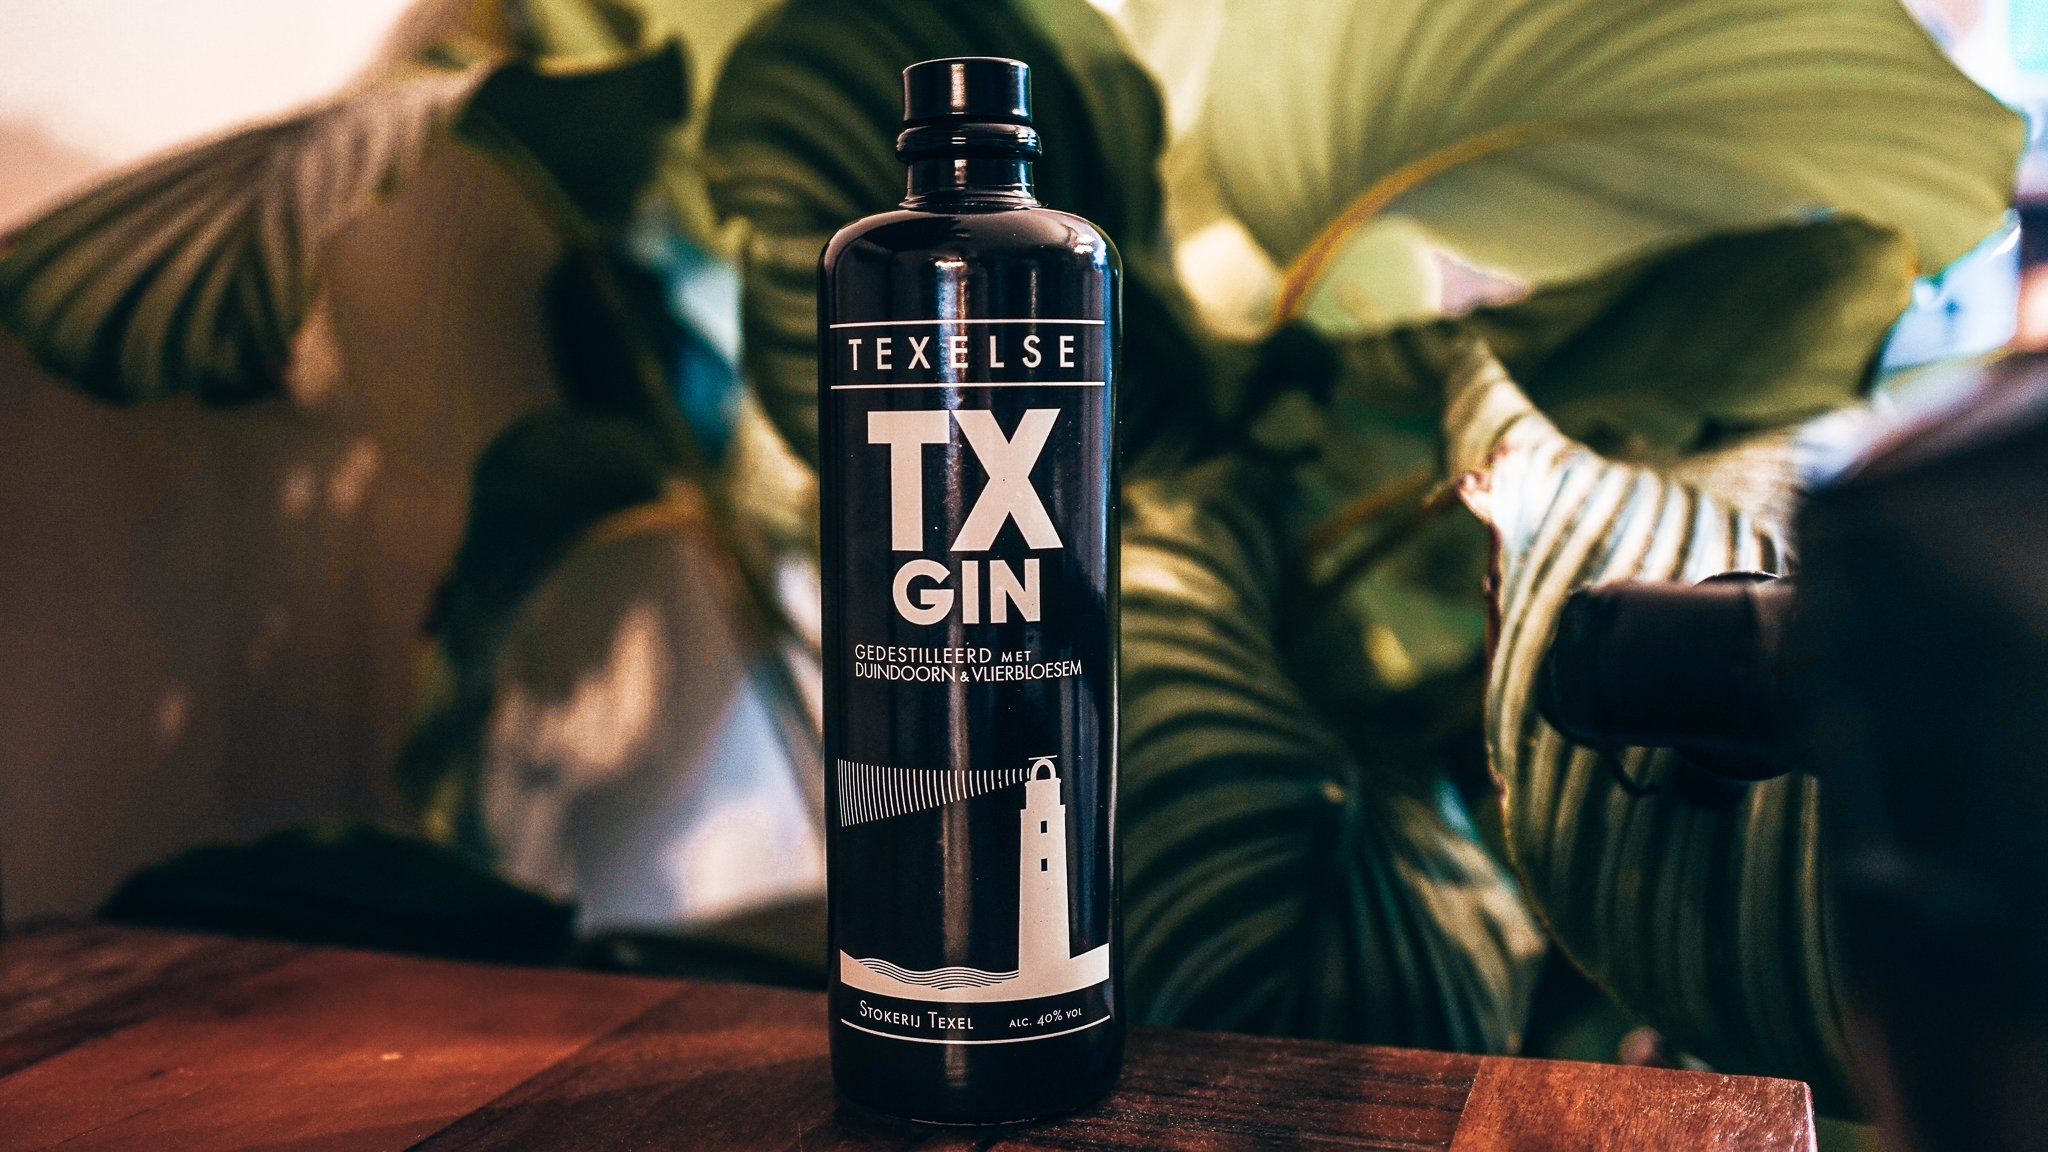 Fles van TX Gin, Alles over gin.